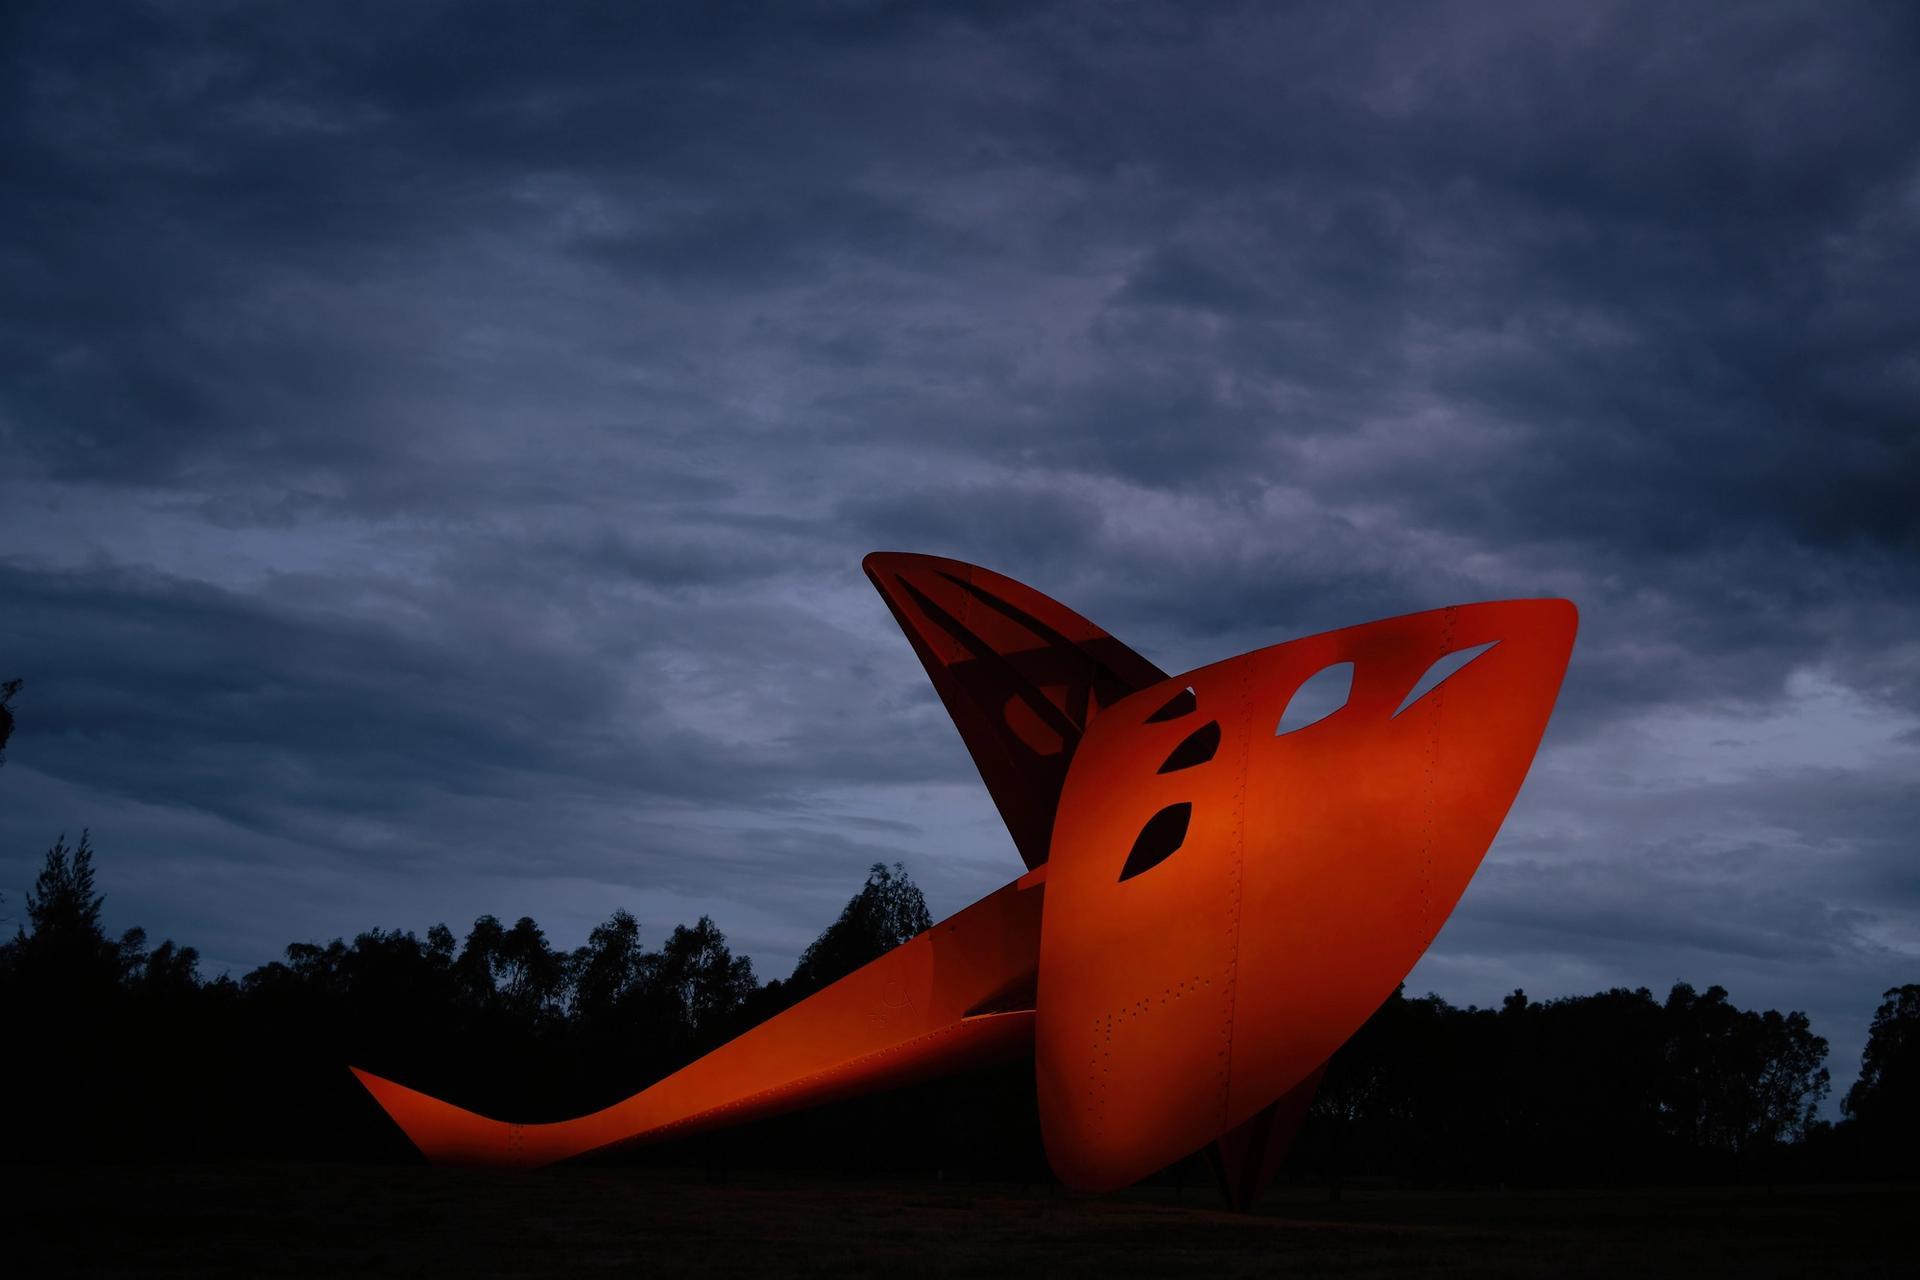 Alexander Calder's Flying Dragon (1975) © 2021 Calder Foundation, New York / Artists Rights Society (ARS), New York. Photo: Darren James Photography